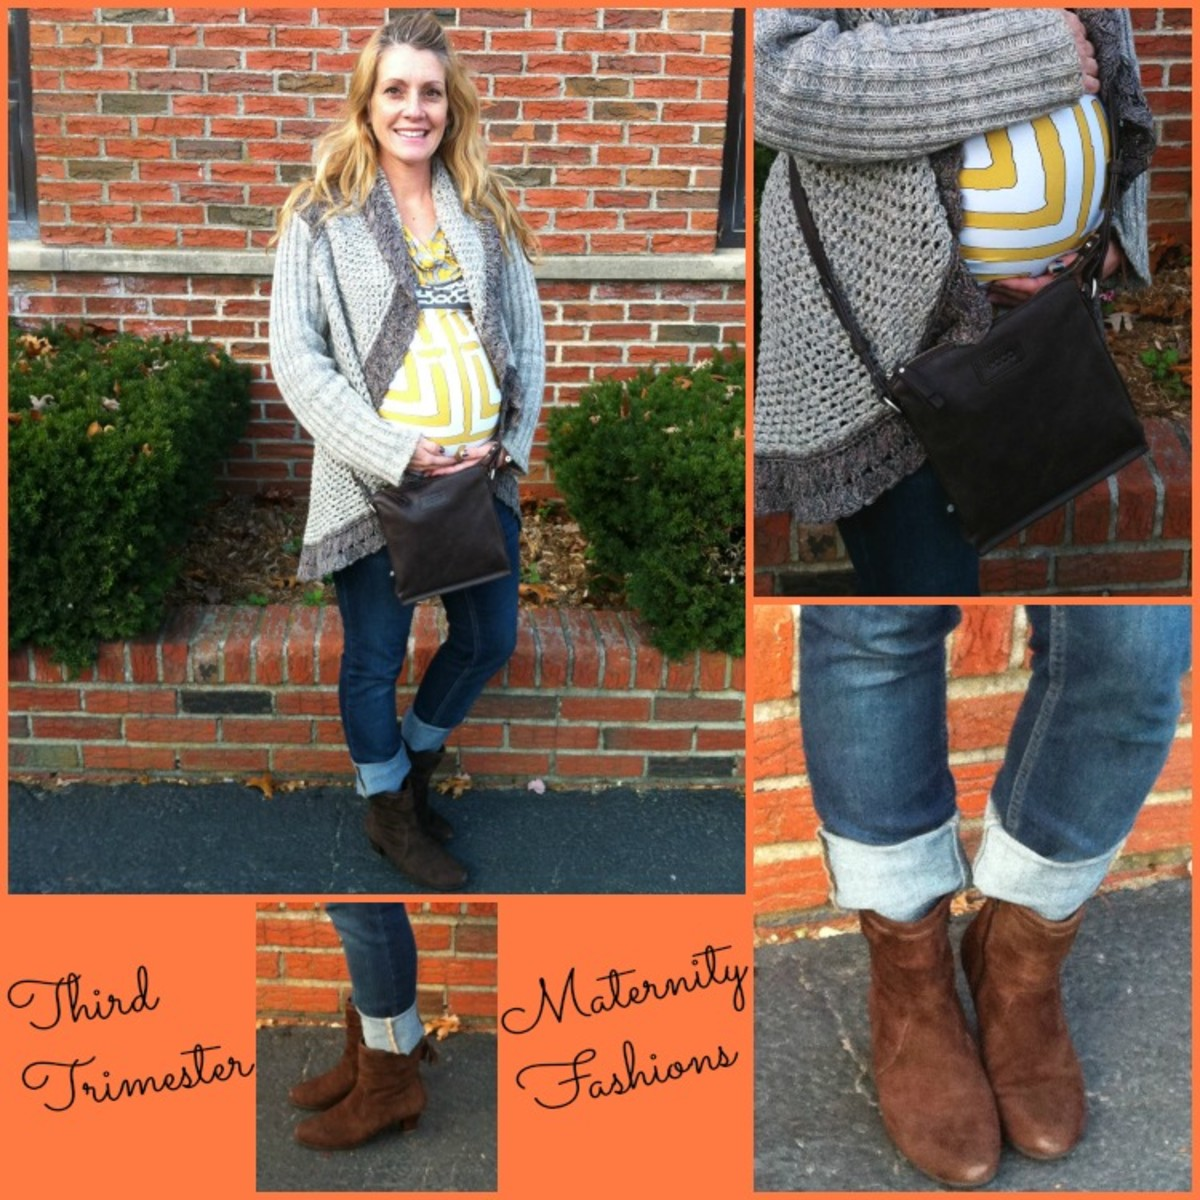 fall maternity fashions, thrid trimester, umberto raffini booties, oilan, elm baby, ECCO bari crossbody